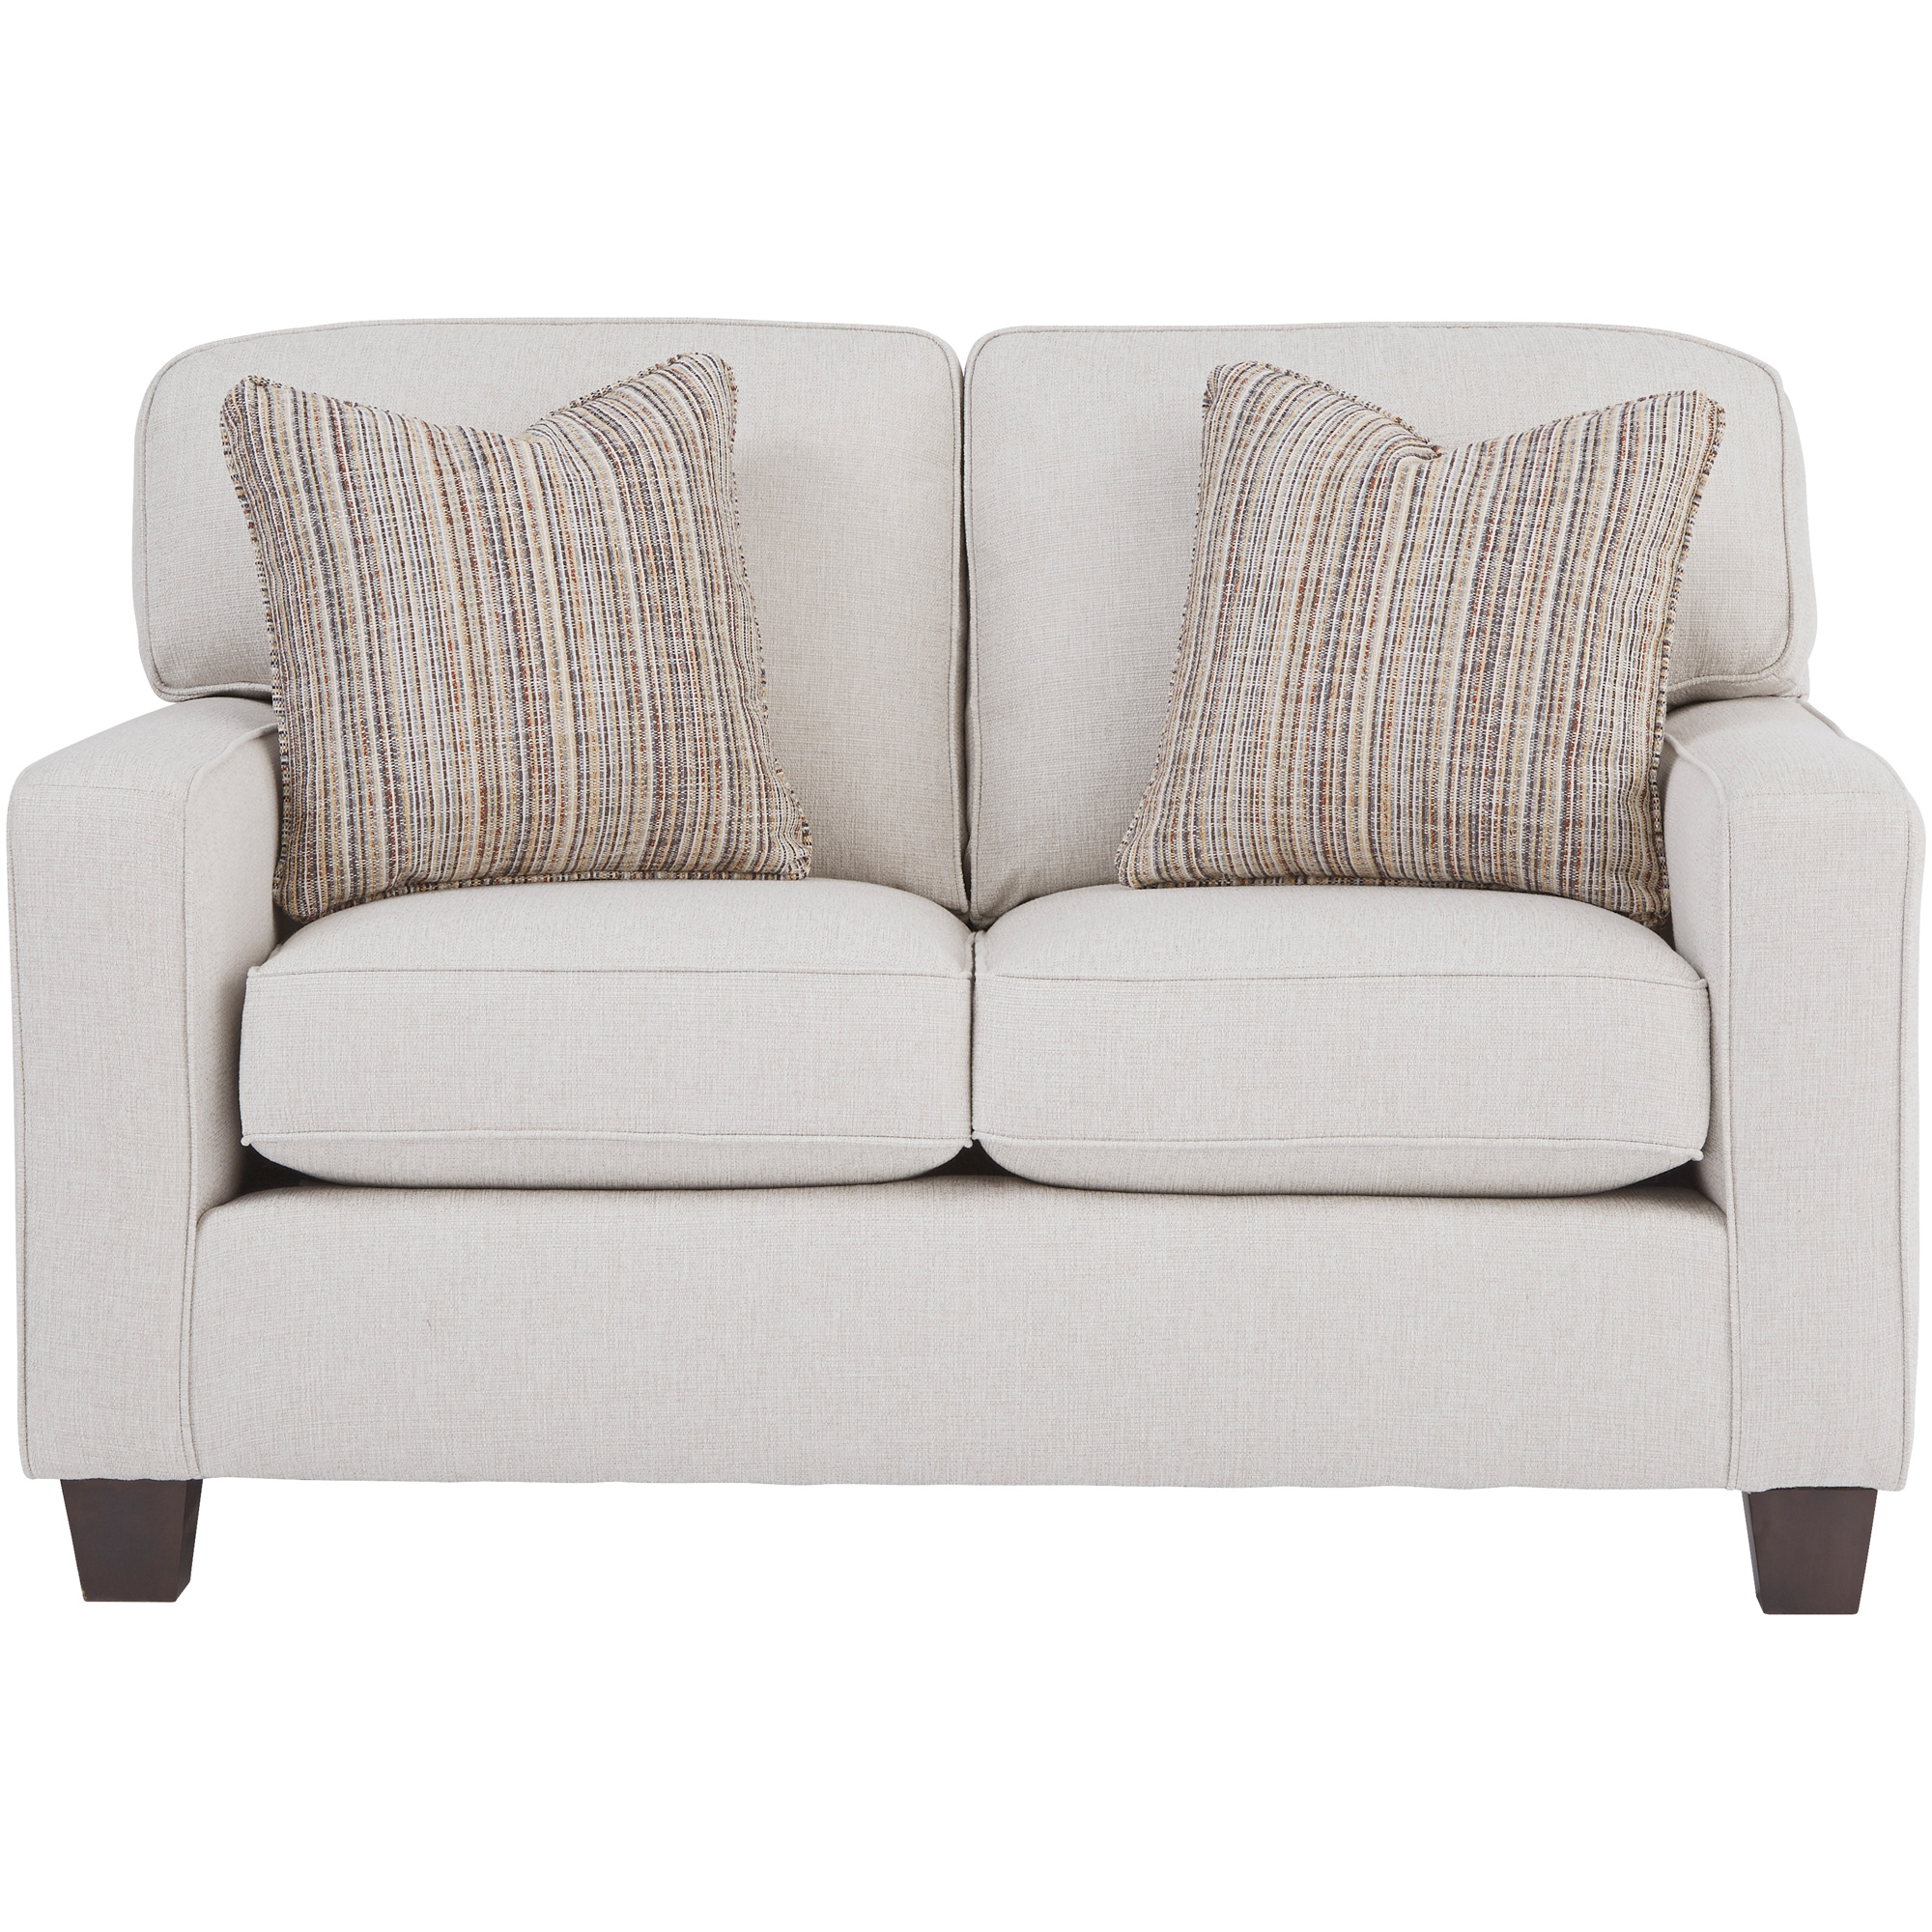 Best Home Furnishings | Annabel Cream Loveseat Sofa